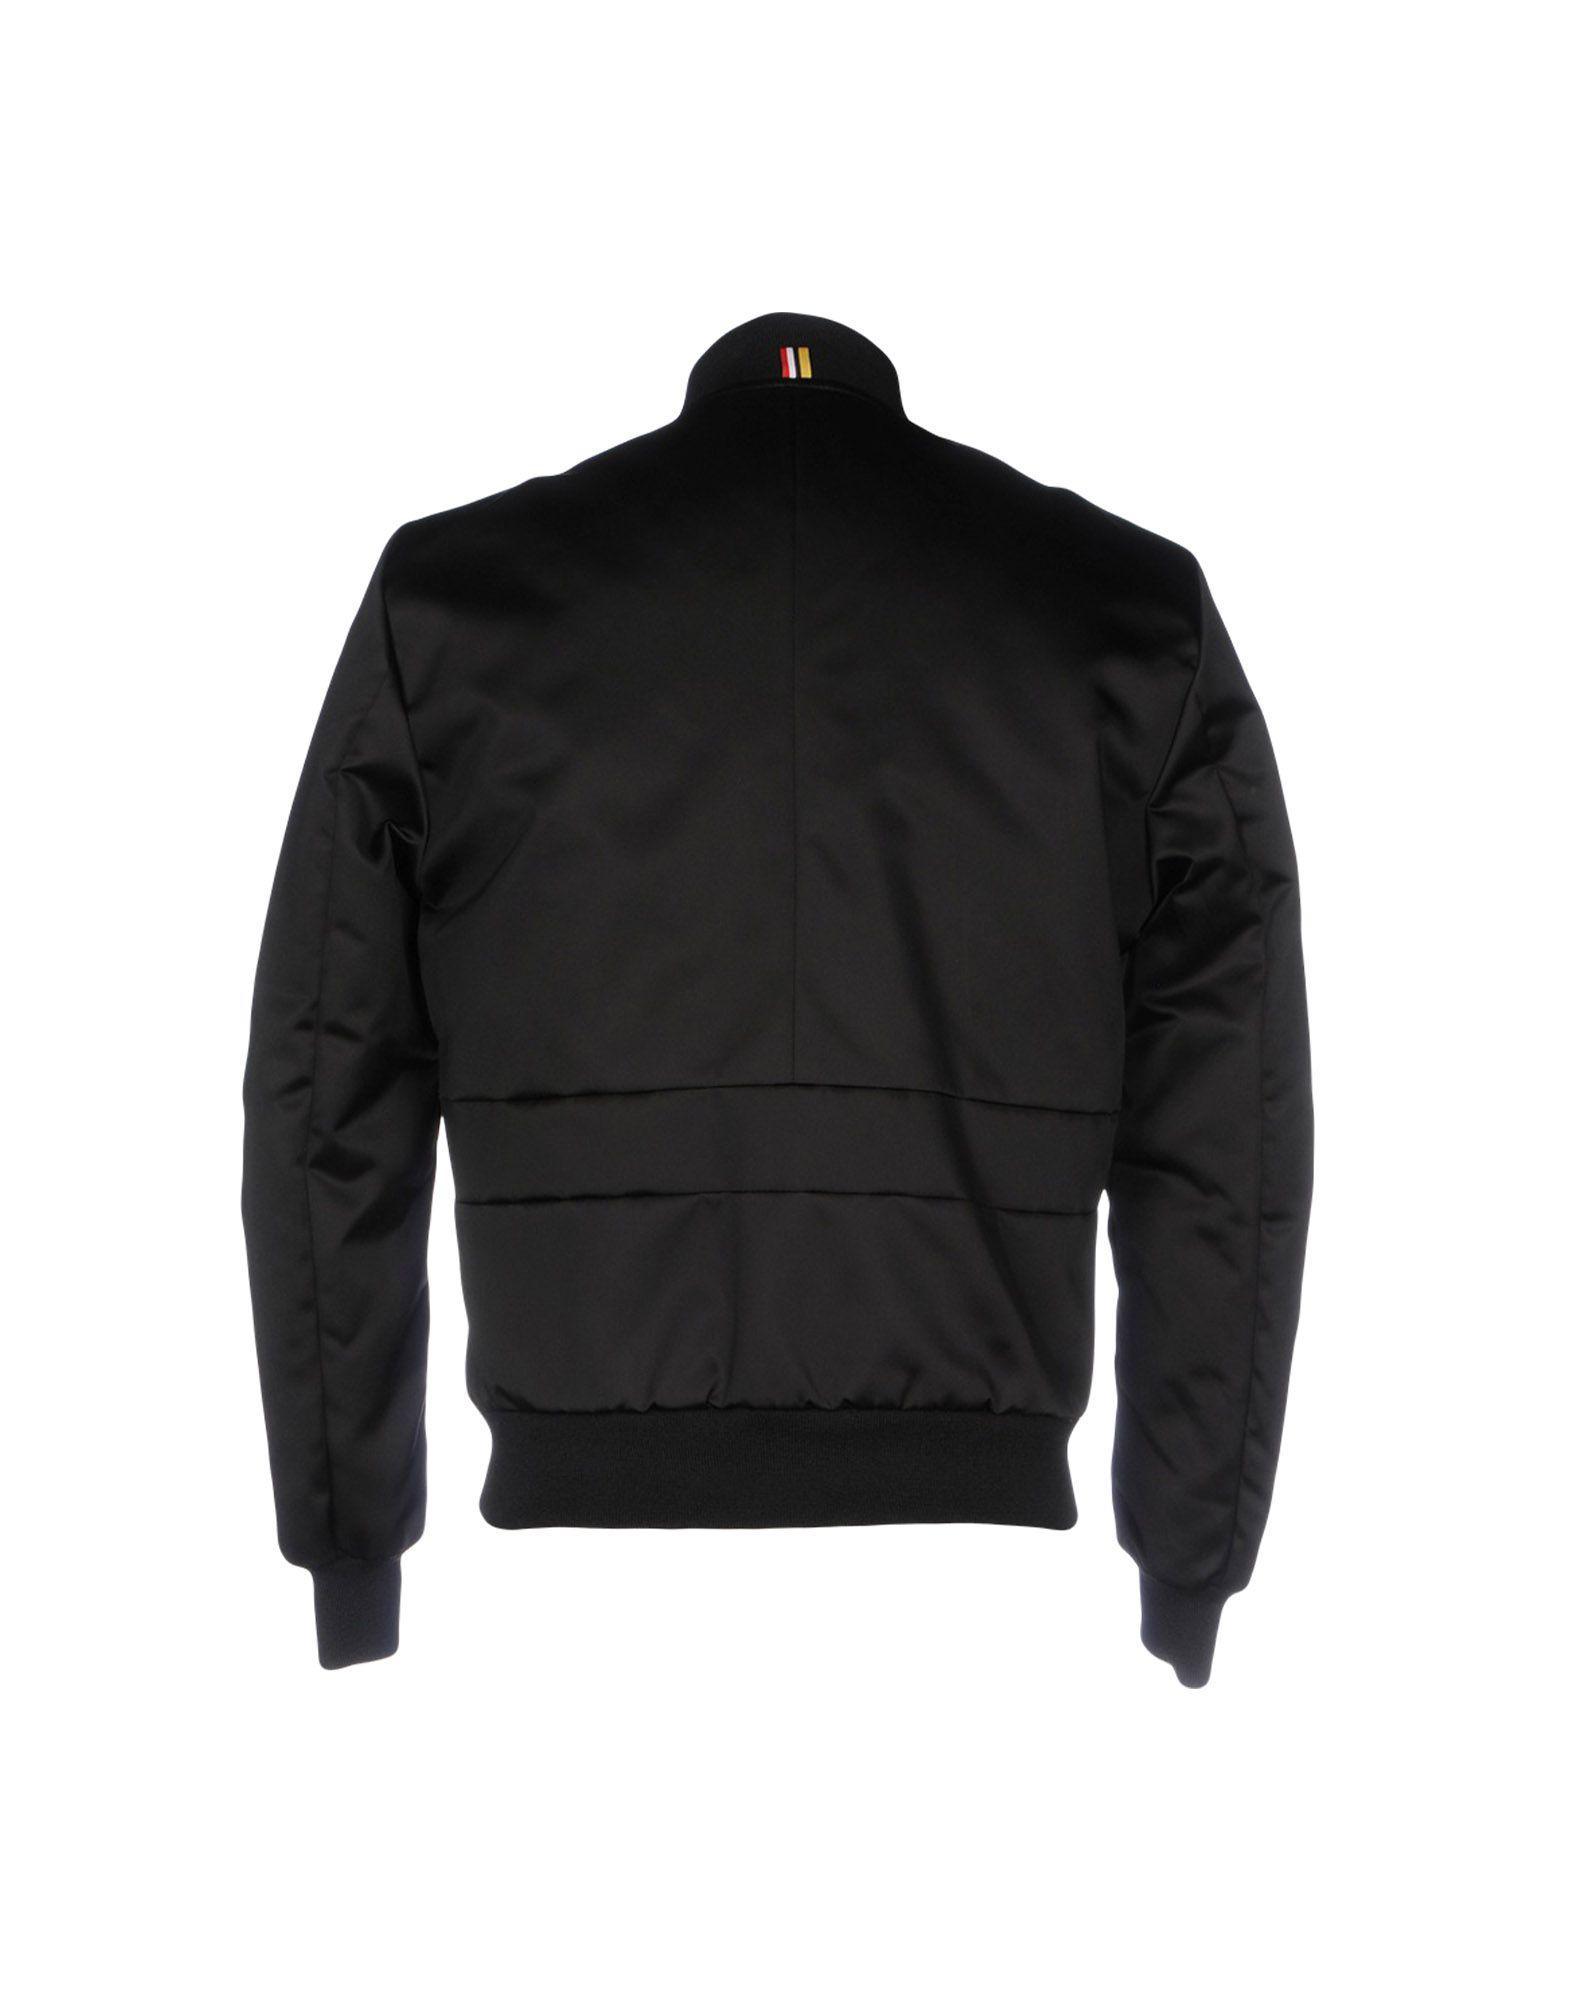 Low Brand Satin Jacket in Black for Men